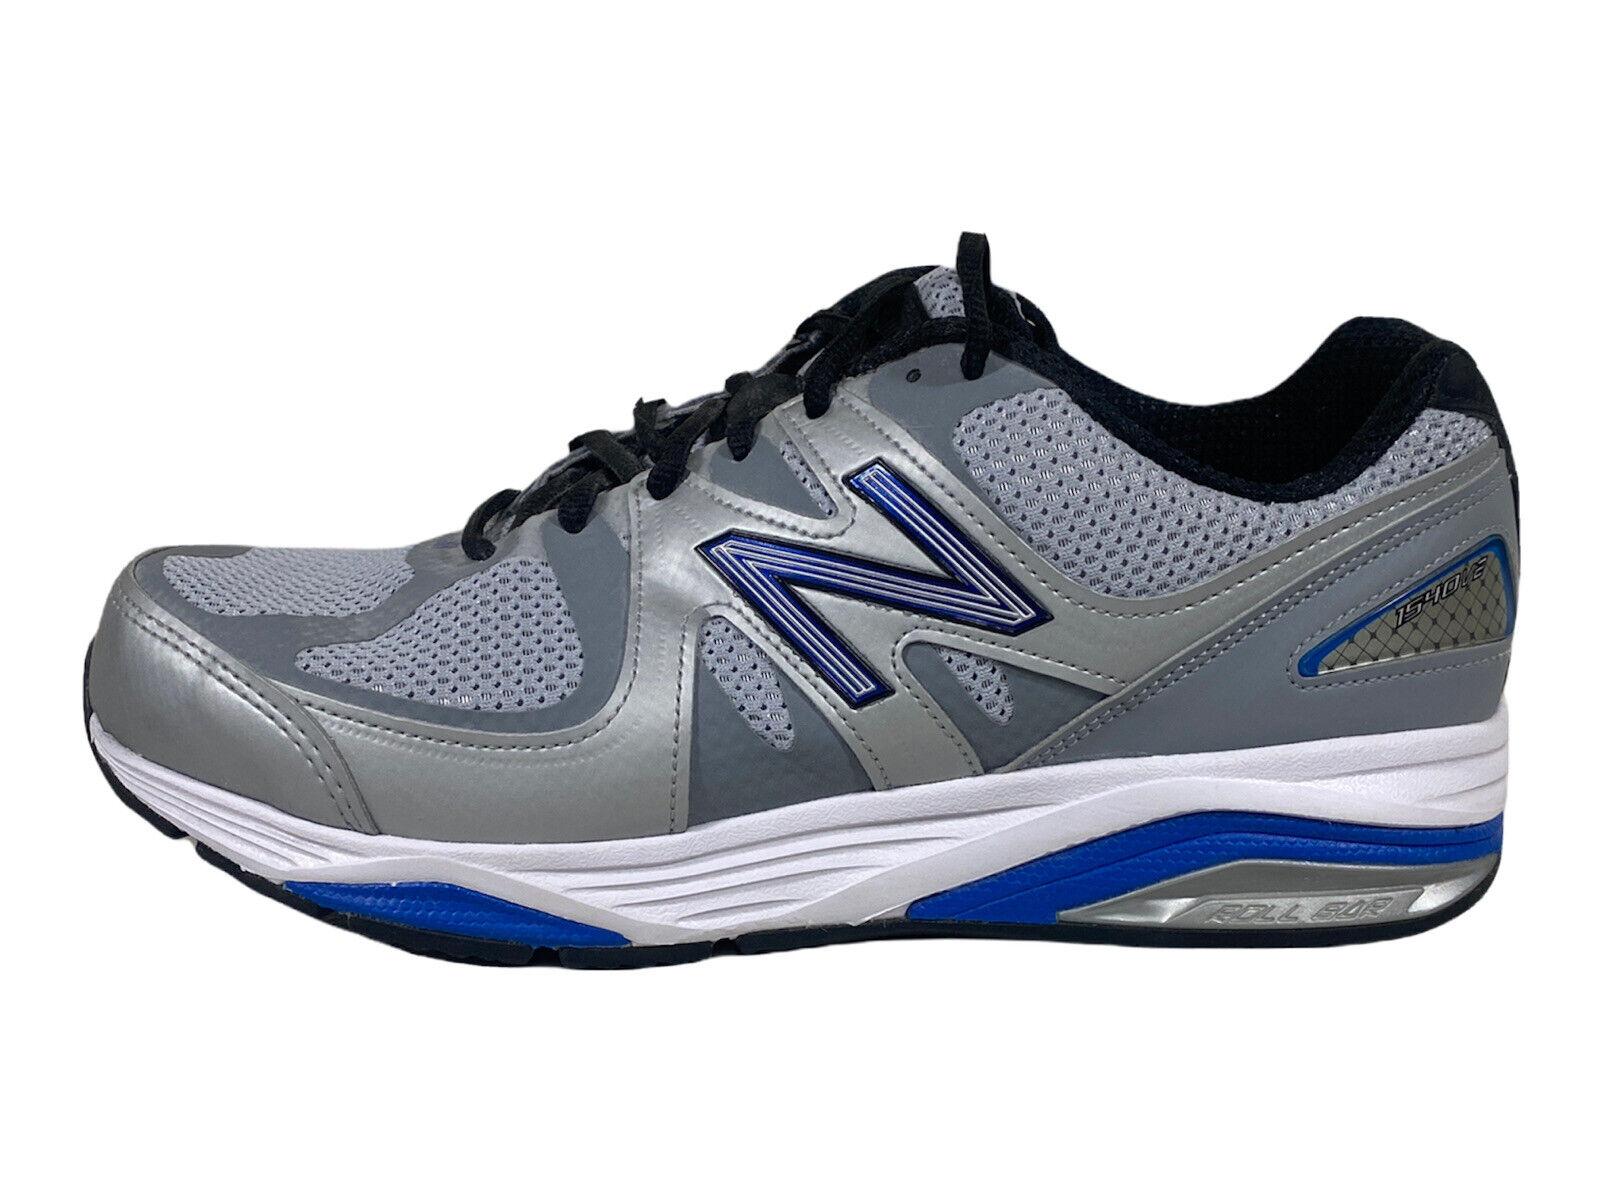 New Balance 1540v2 Blue Gray Running Training Shoes USA Men's Size 8 6E READ